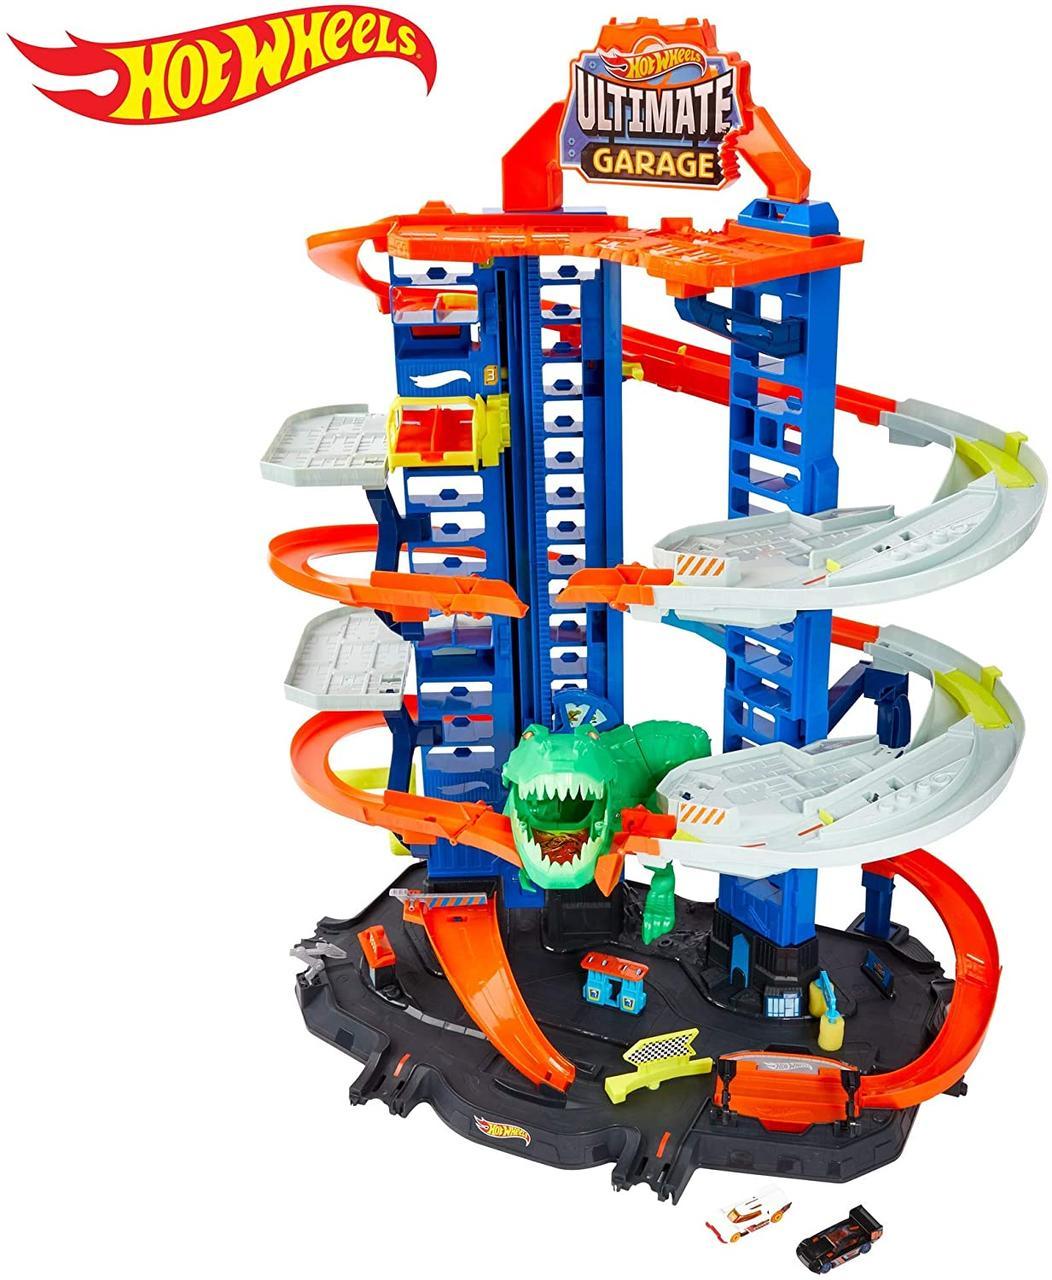 Хот Вилс Ультимейт гараж Ти-Рекс Hot Wheels City Ultimate Garage, Chomping T-Rex